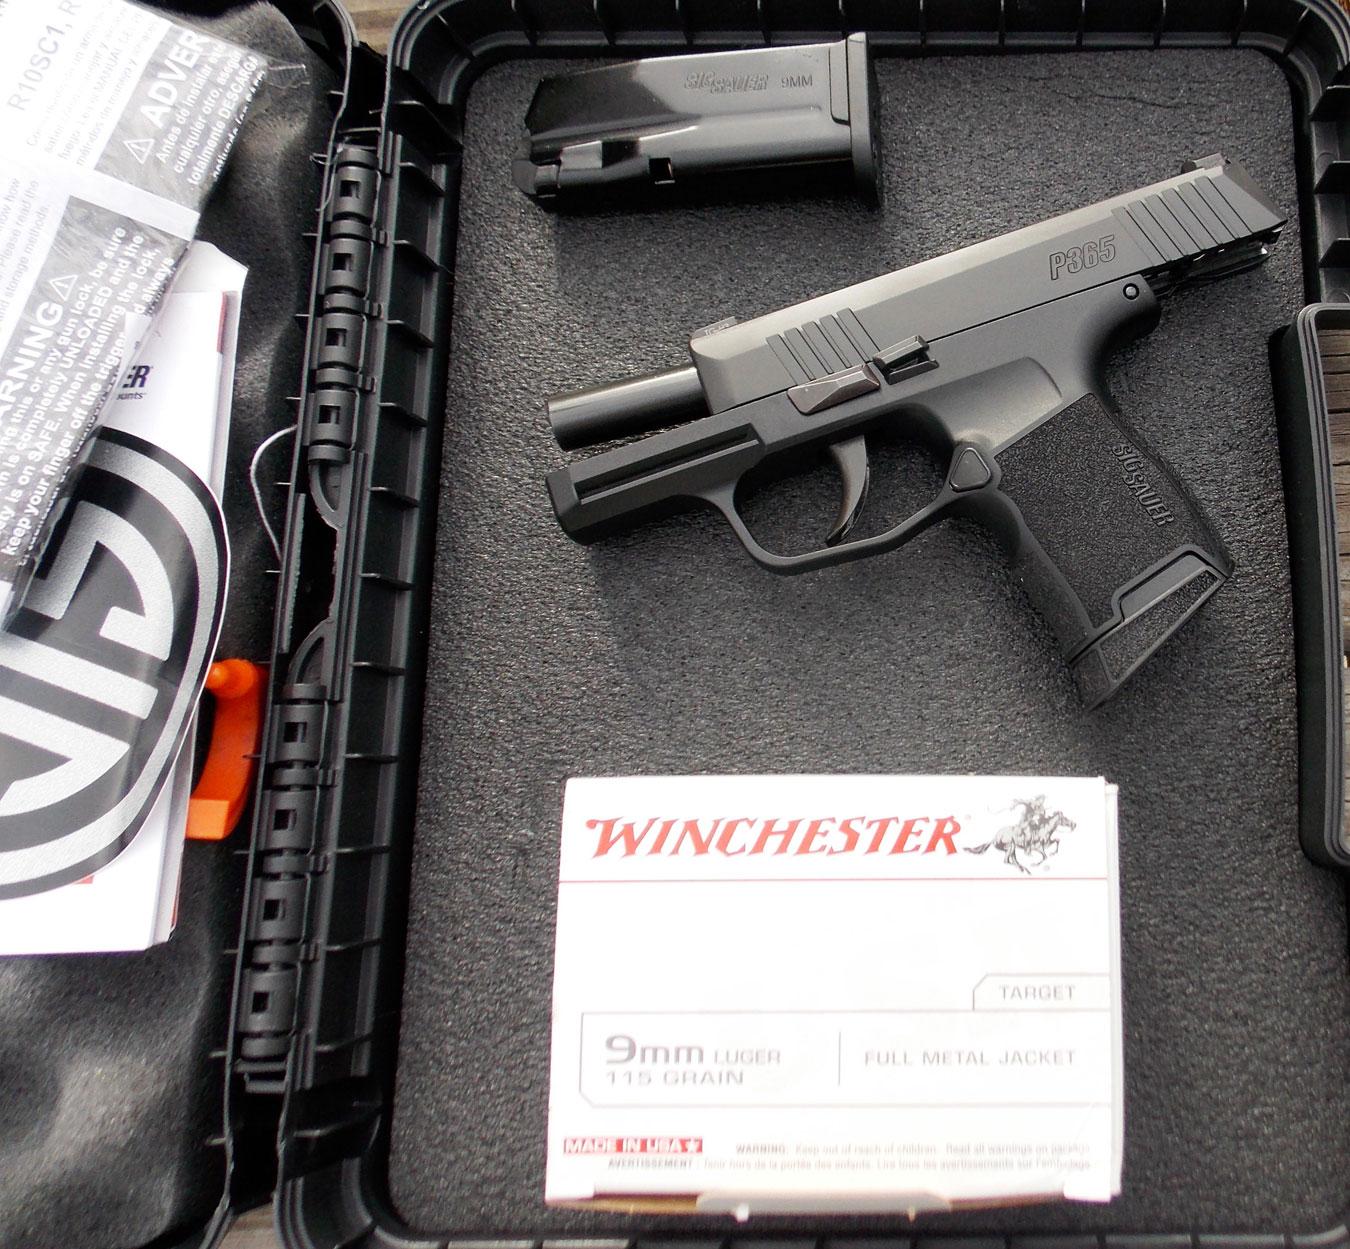 Range Review: SIG P365 — The Smashing Little 9mm - The K-Var